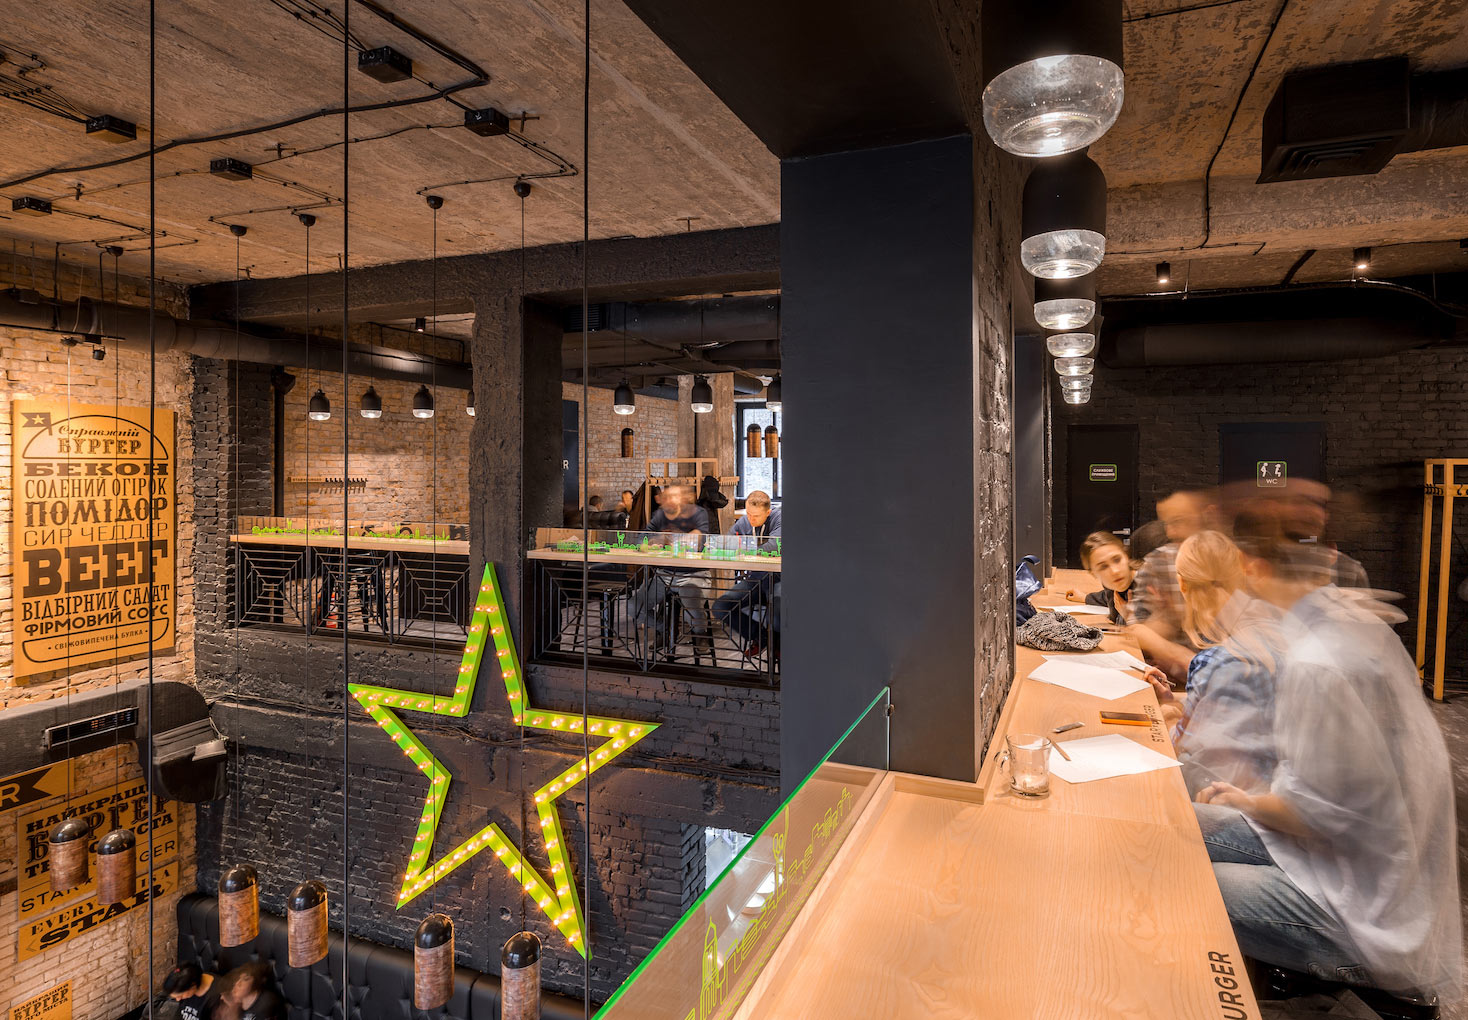 Star Burger An Industrial Restaurant Design  Adorable Home